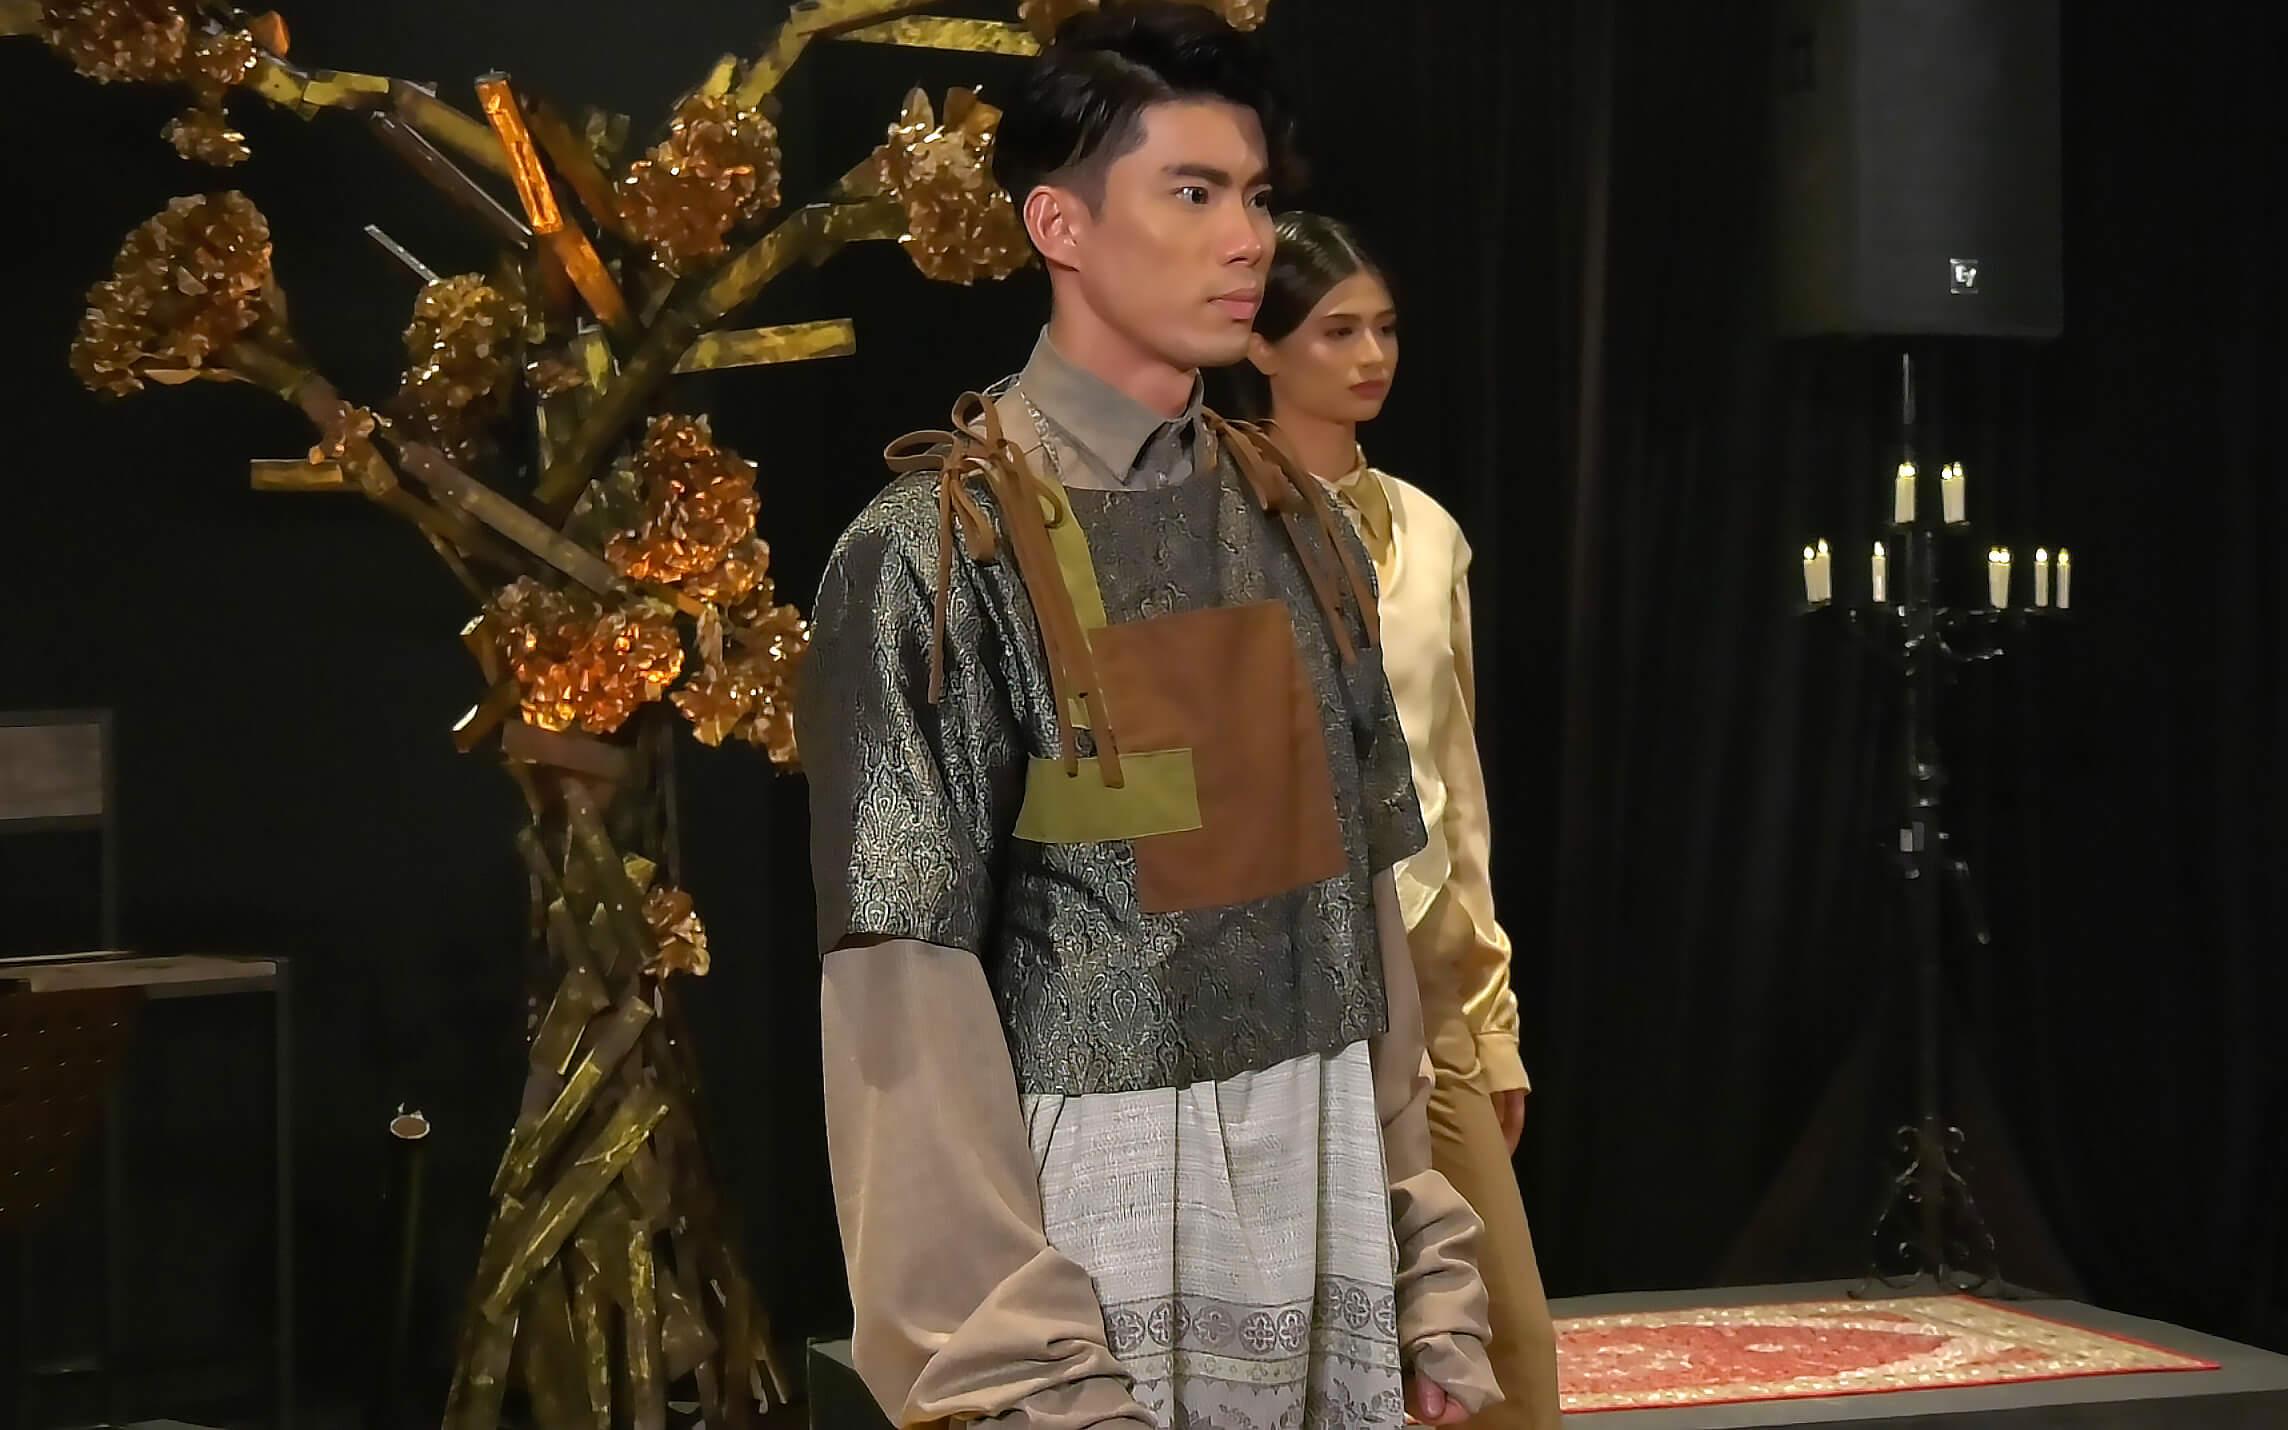 Arab Street URA Raffles Recreating the Textile Culture Collaboration from One Kampung Glam Cahaya Ramadan Live Stream Fashion Show 10